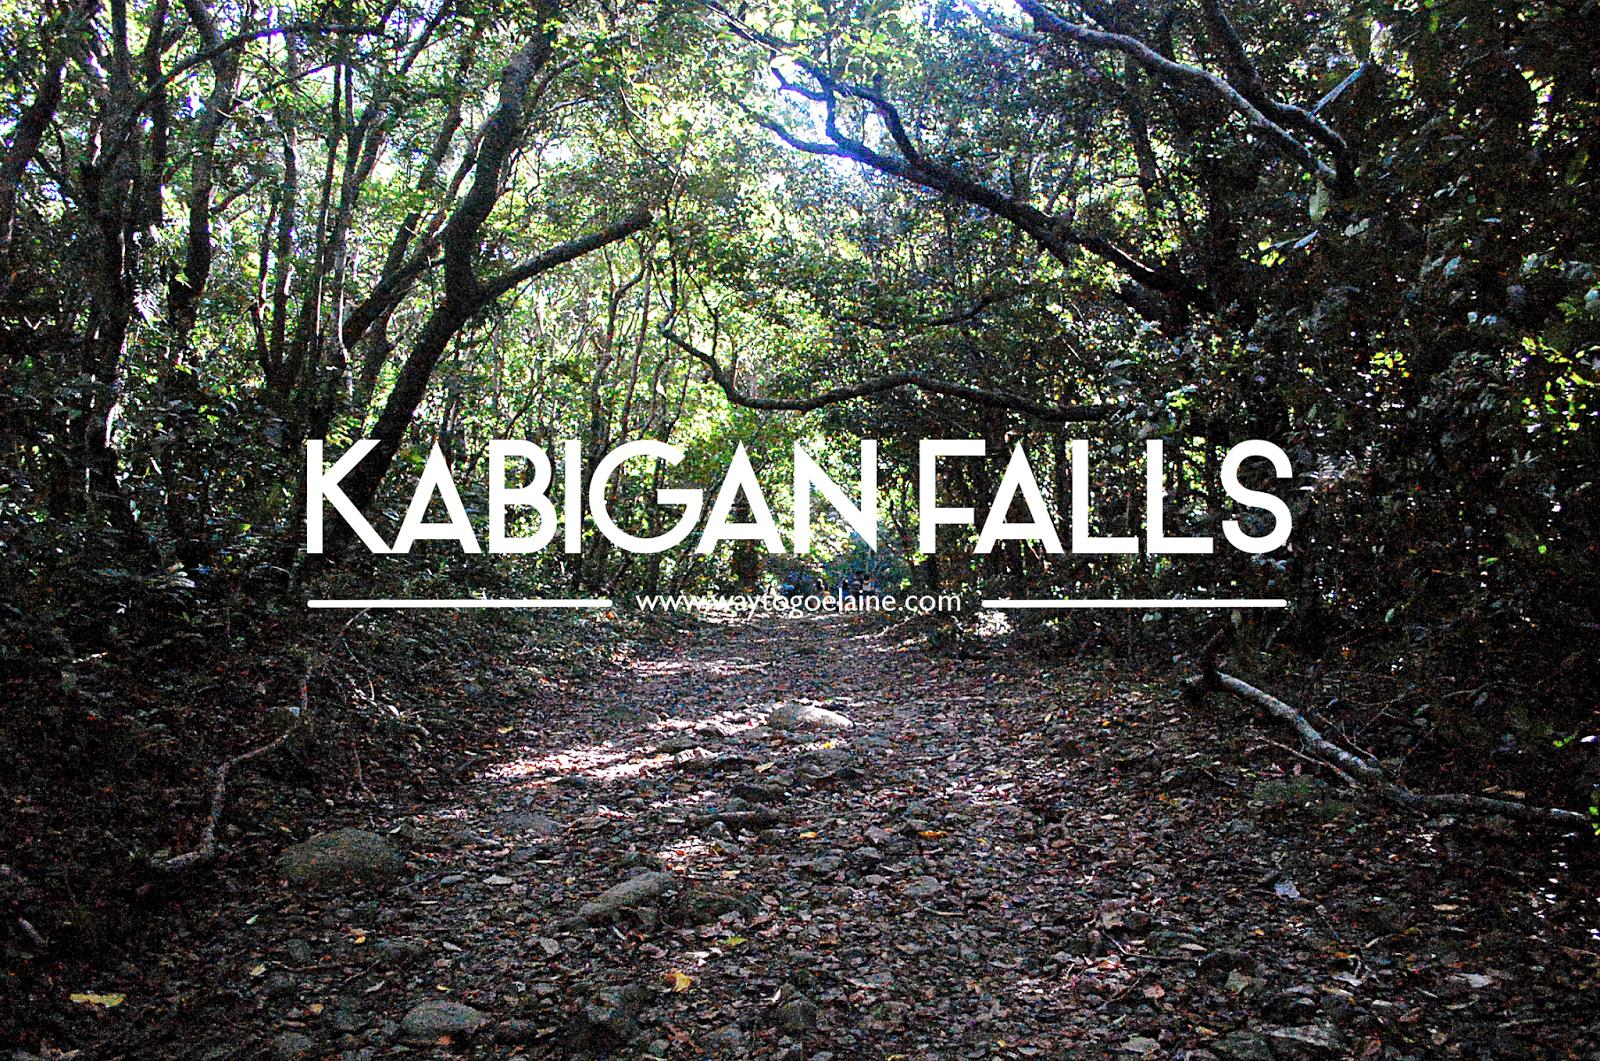 Kabigan Falls - waytogoelaine.com